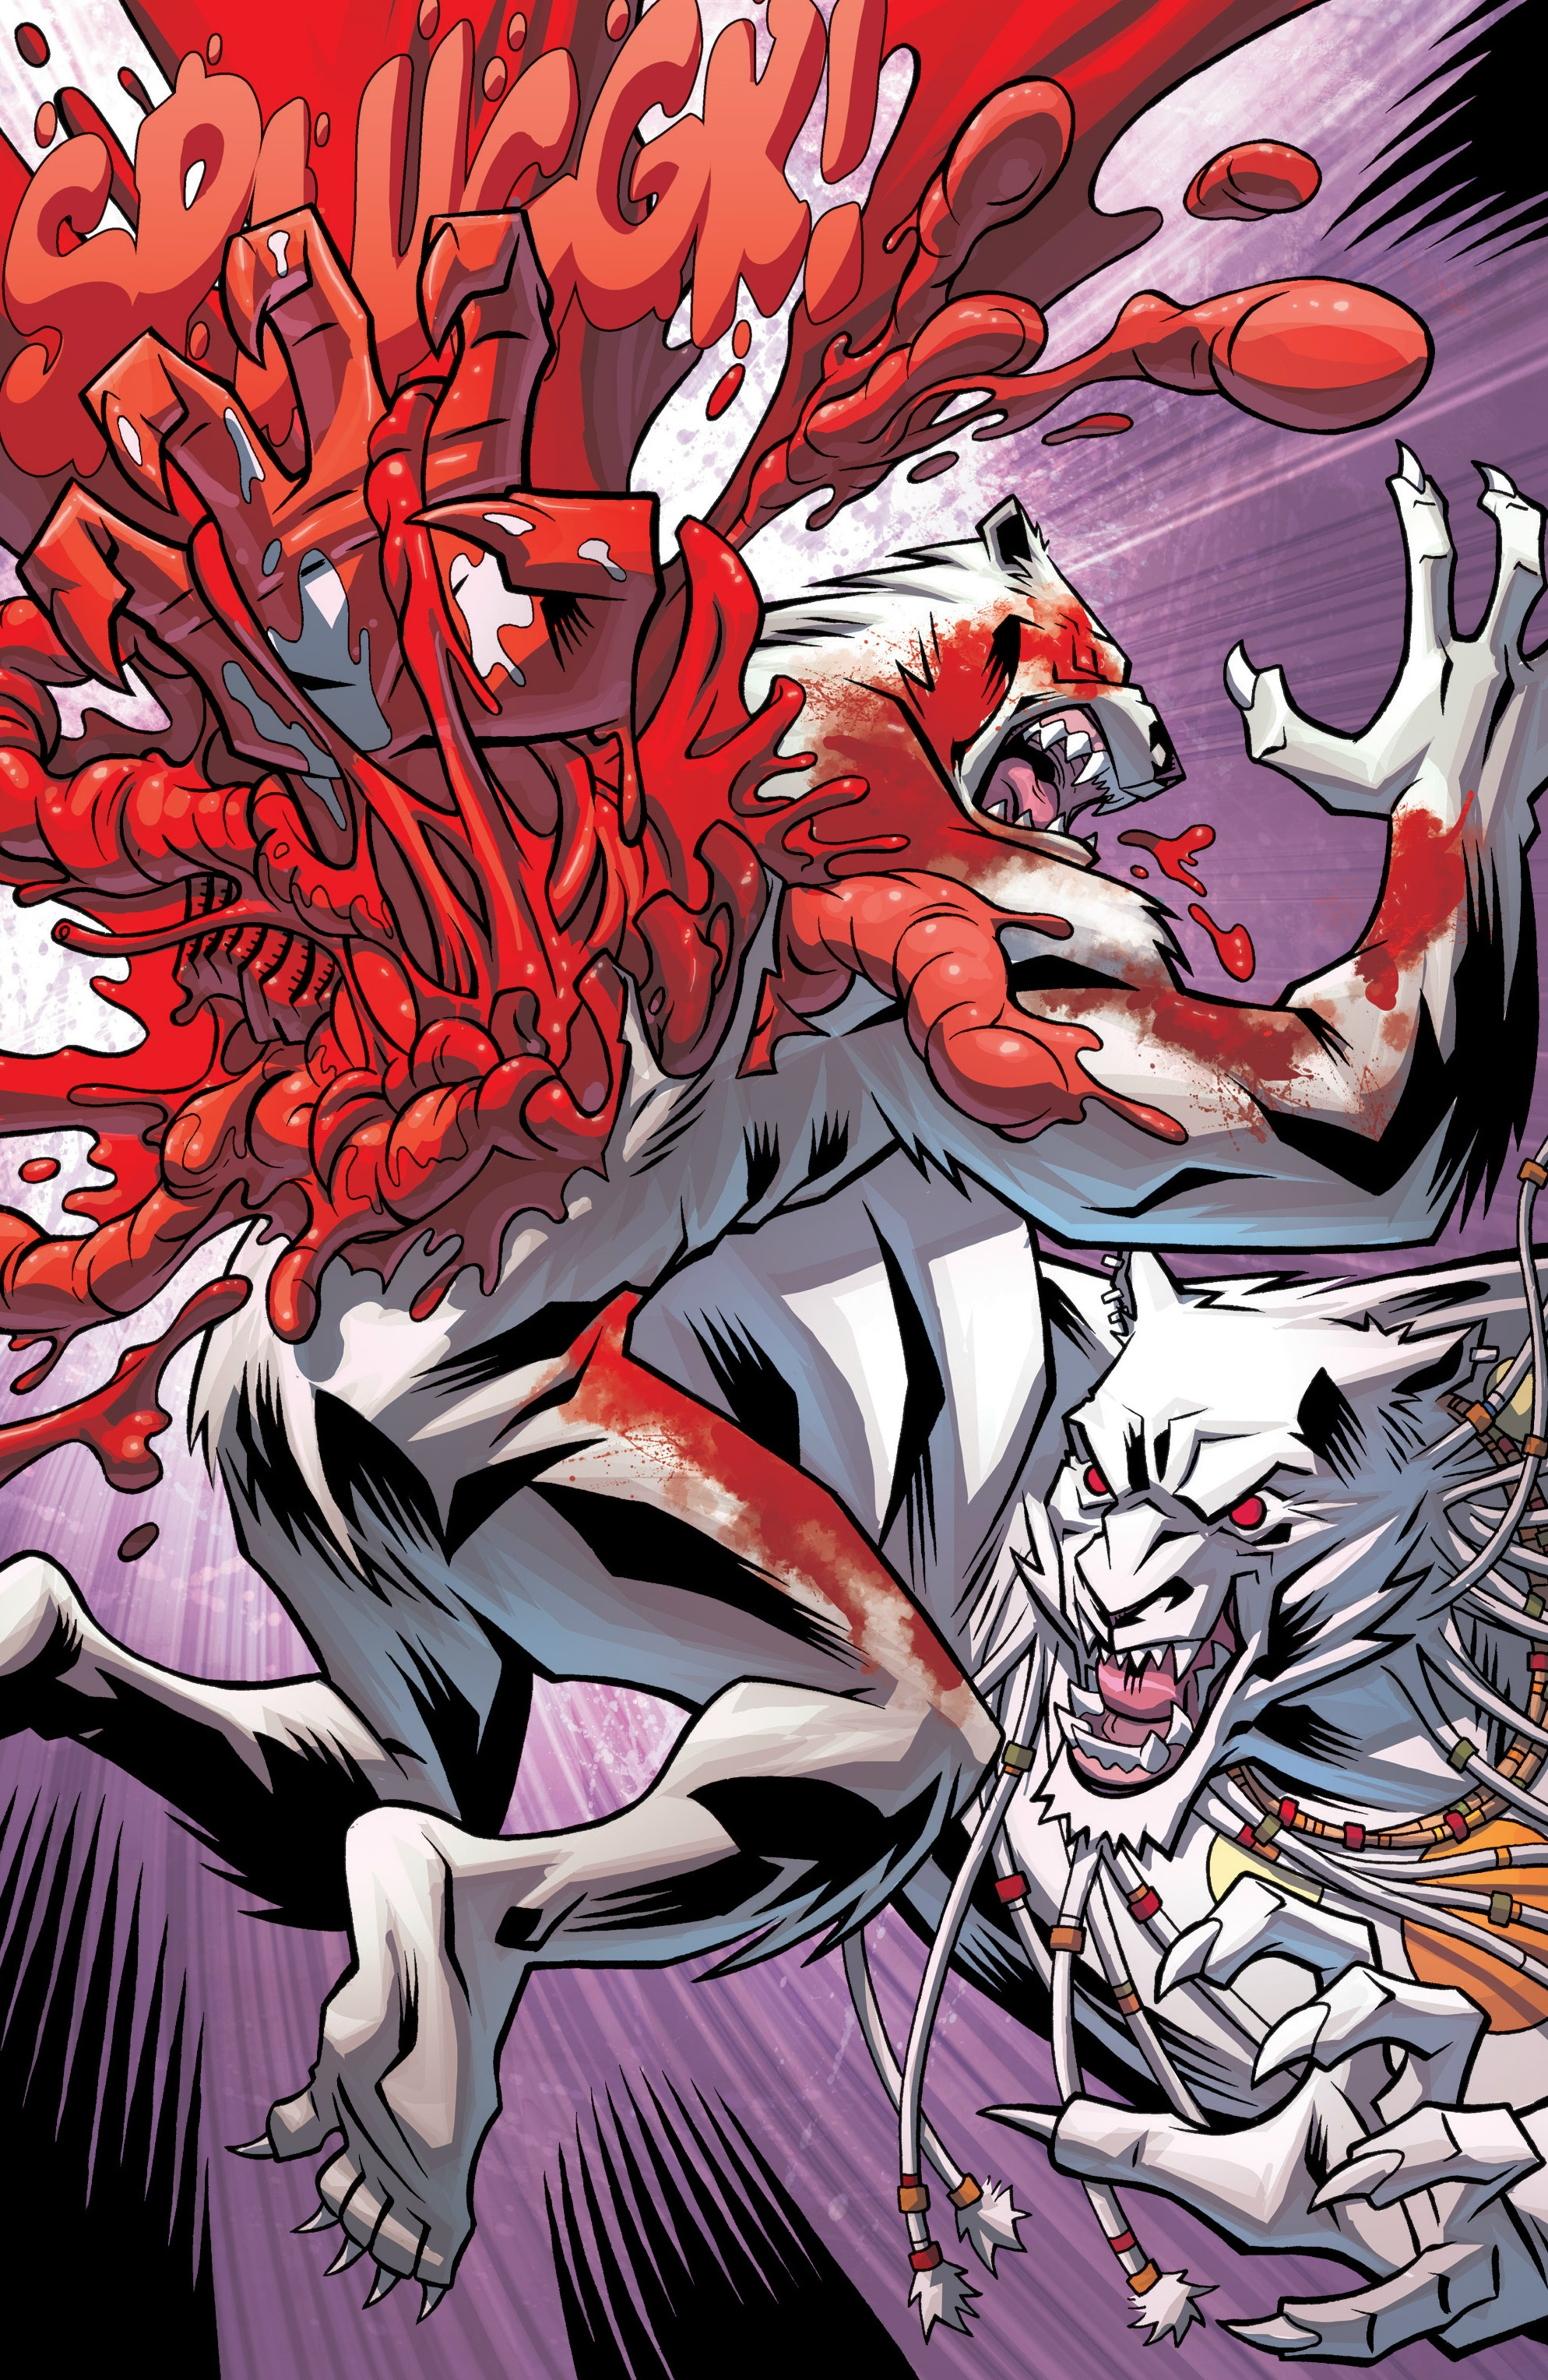 Astounding Wolf-Man Vol 1 9 003.jpg